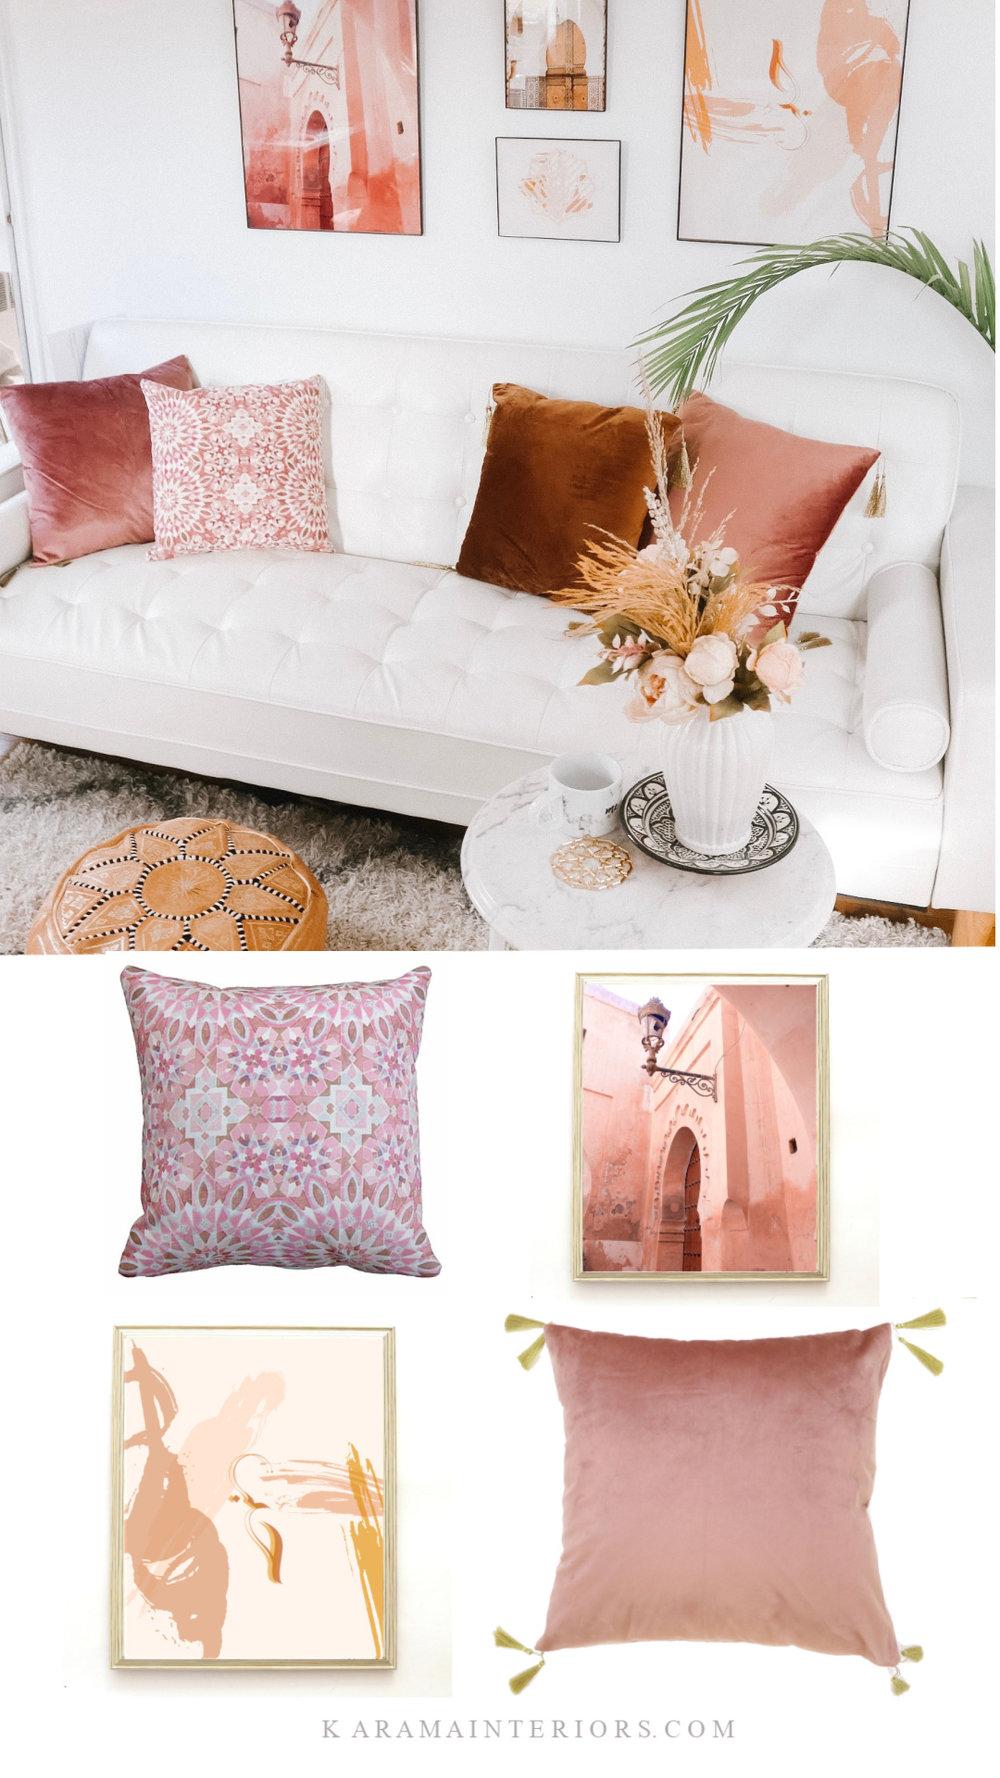 Home Styling Therapy Decor-Boho Moroccan Decor- Karama Interiors Karama Company.jpg